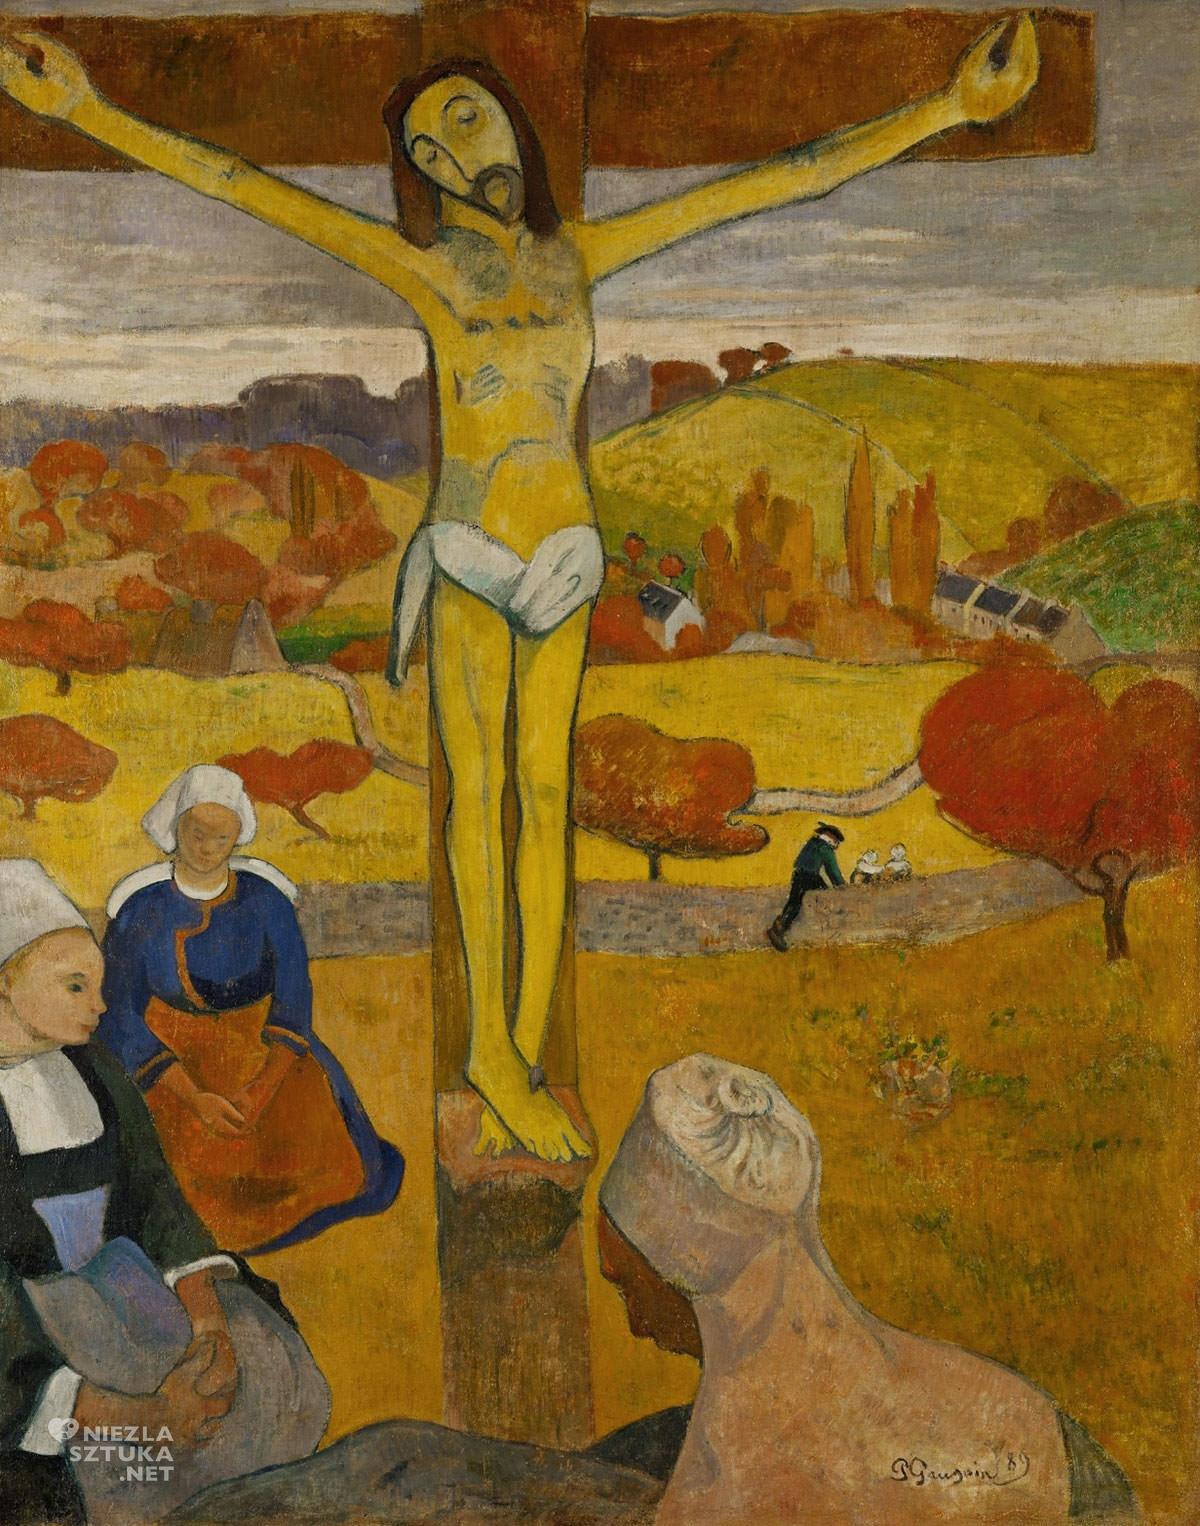 Paul Gauguin, Żółty Chrystus, symbolizm, Niezła Sztuka